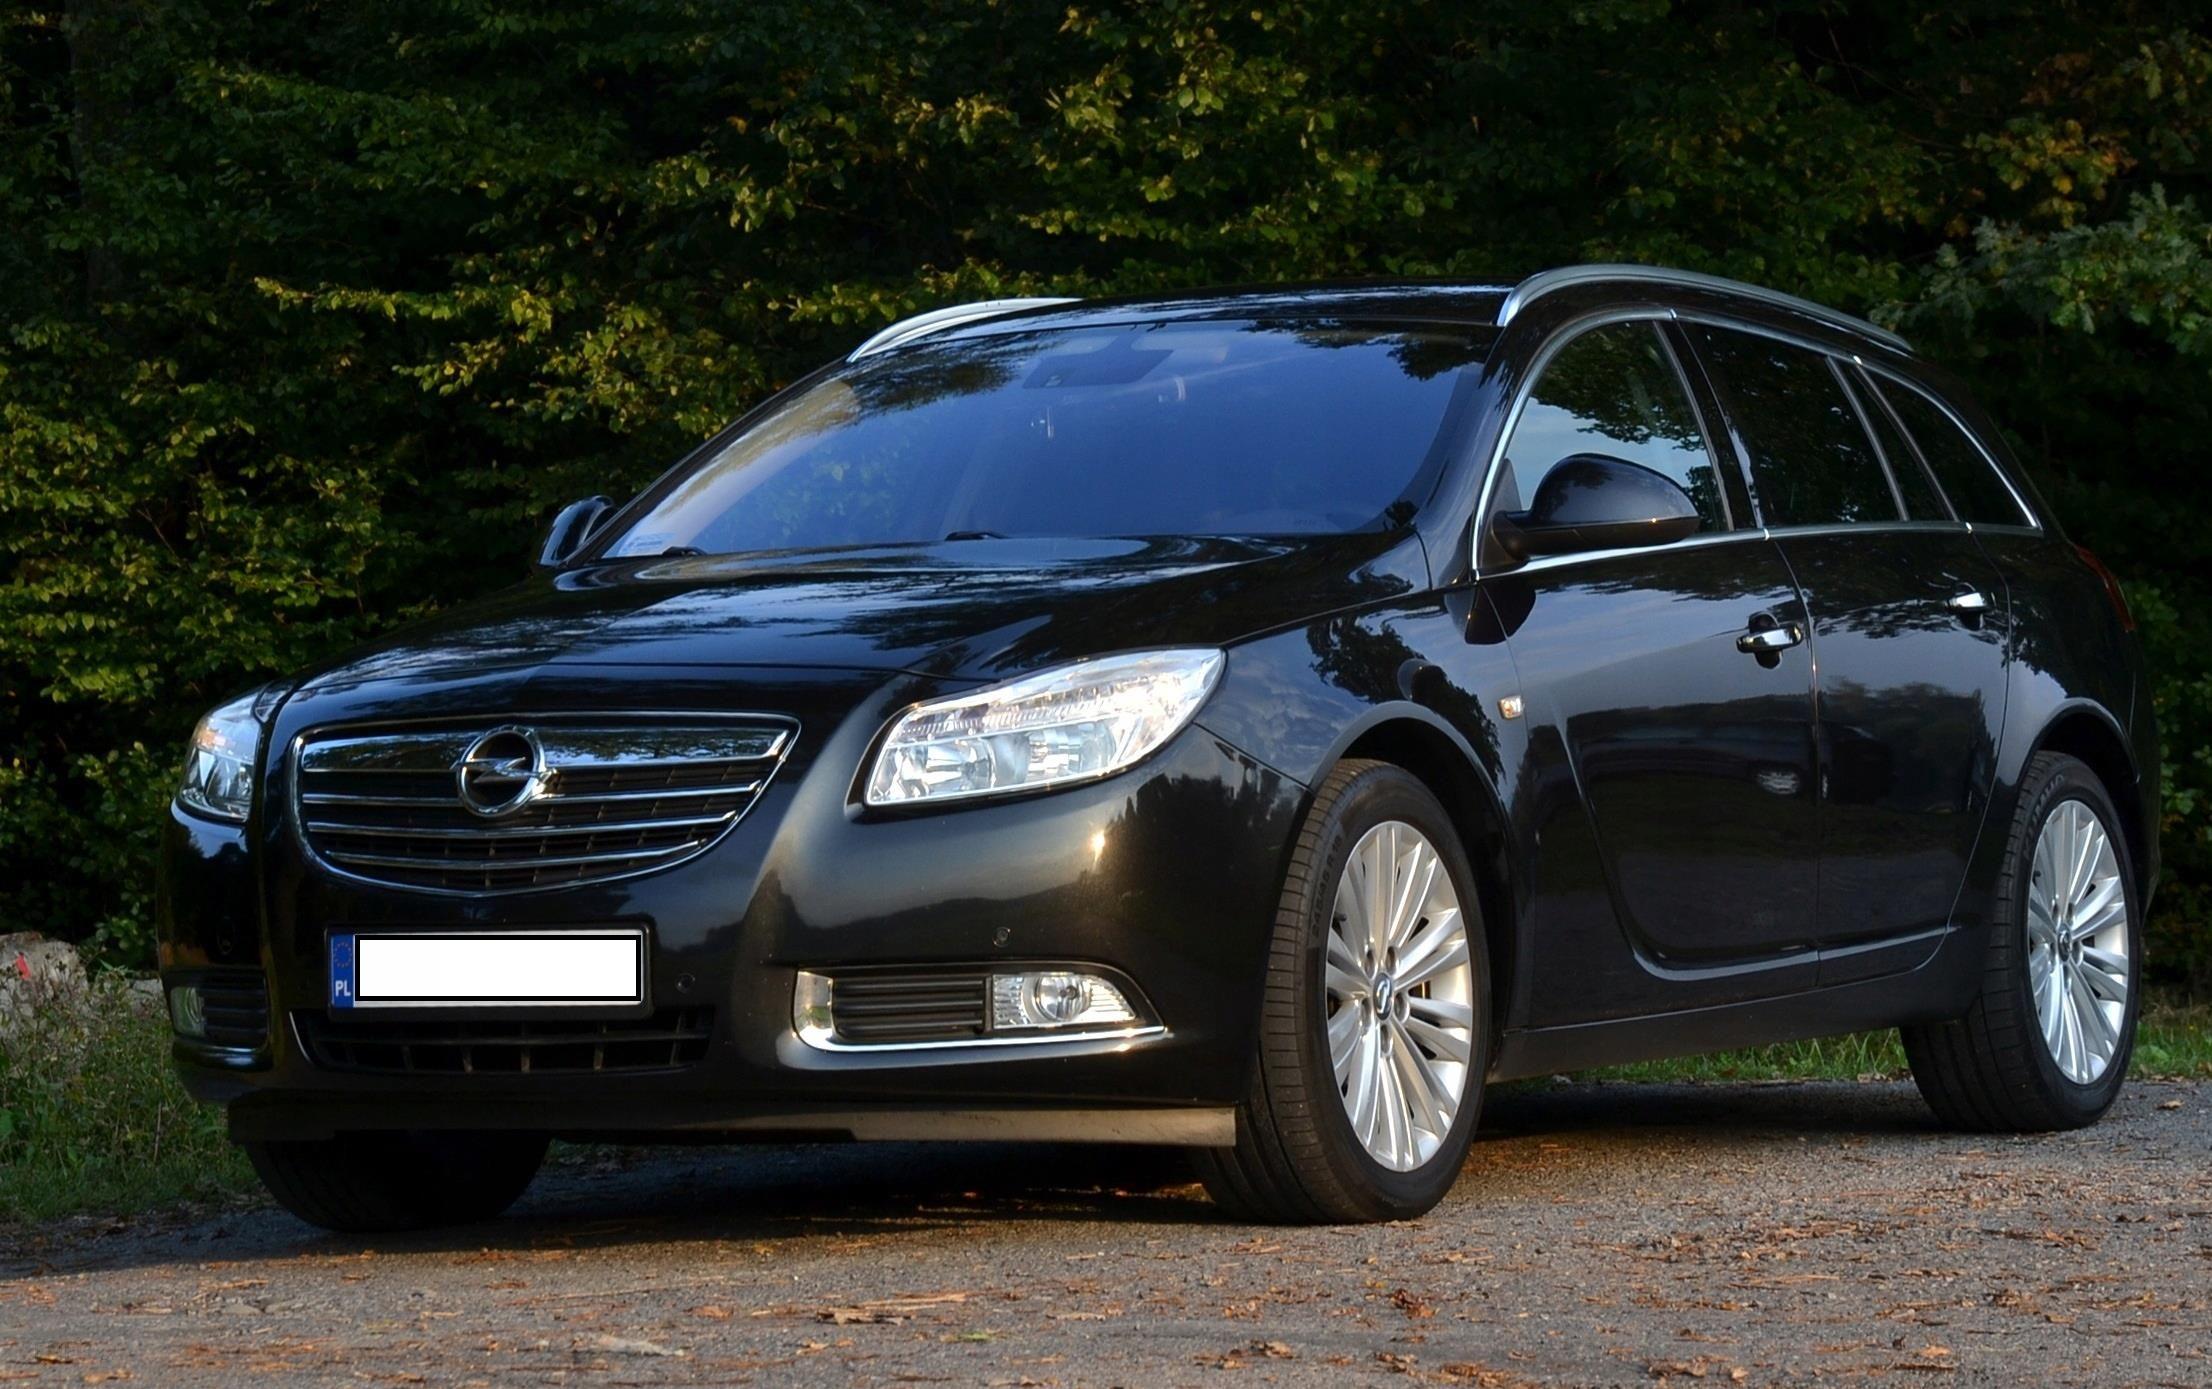 Opel Insignia Cosmo 2 0 Cdti Opinie I Ceny Na Ceneo Pl